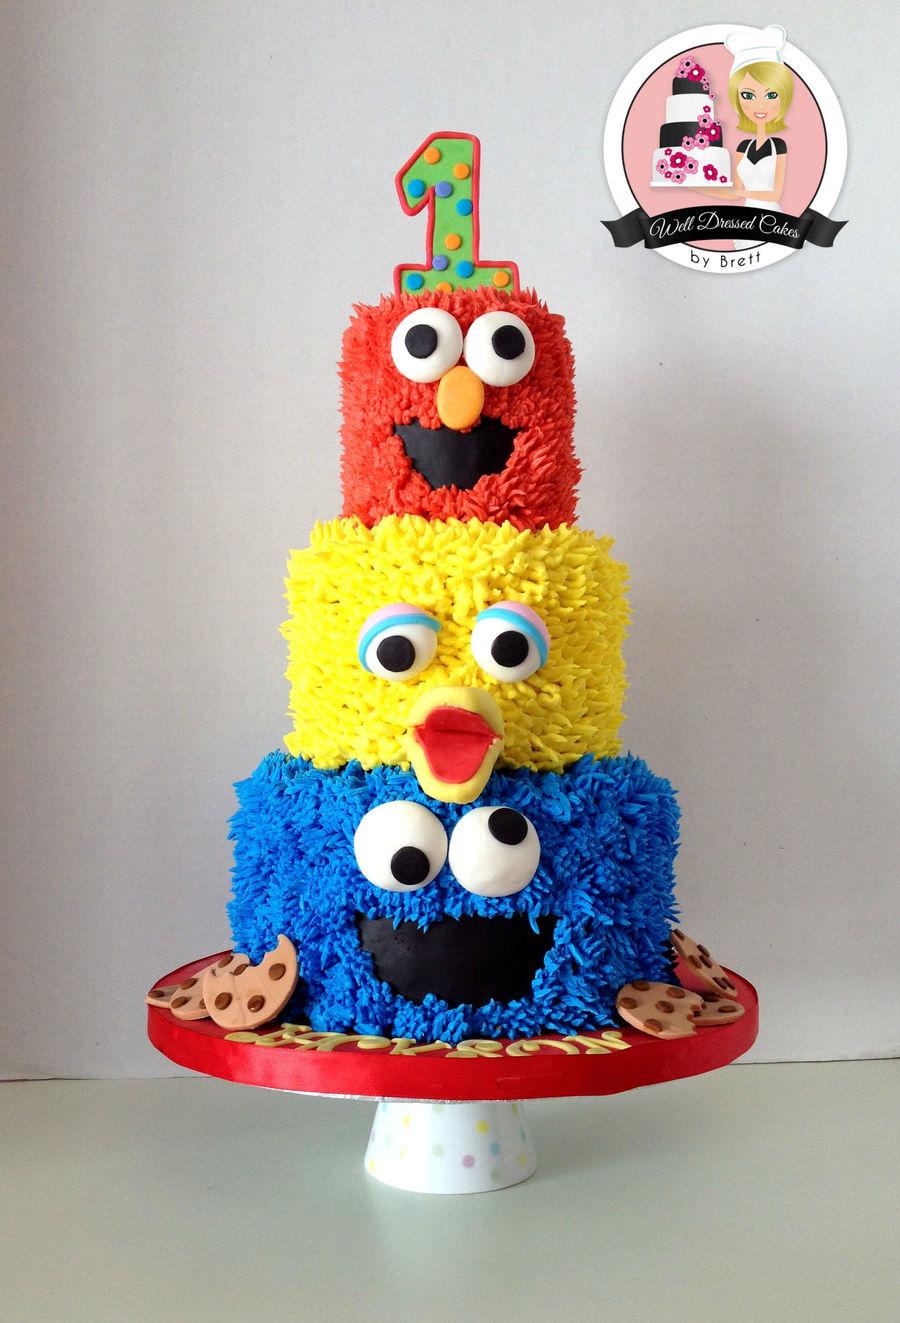 Cake Decorating Sesame Street Birthday : 3 Tier Sesame Street Birthday Cake - CakeCentral.com